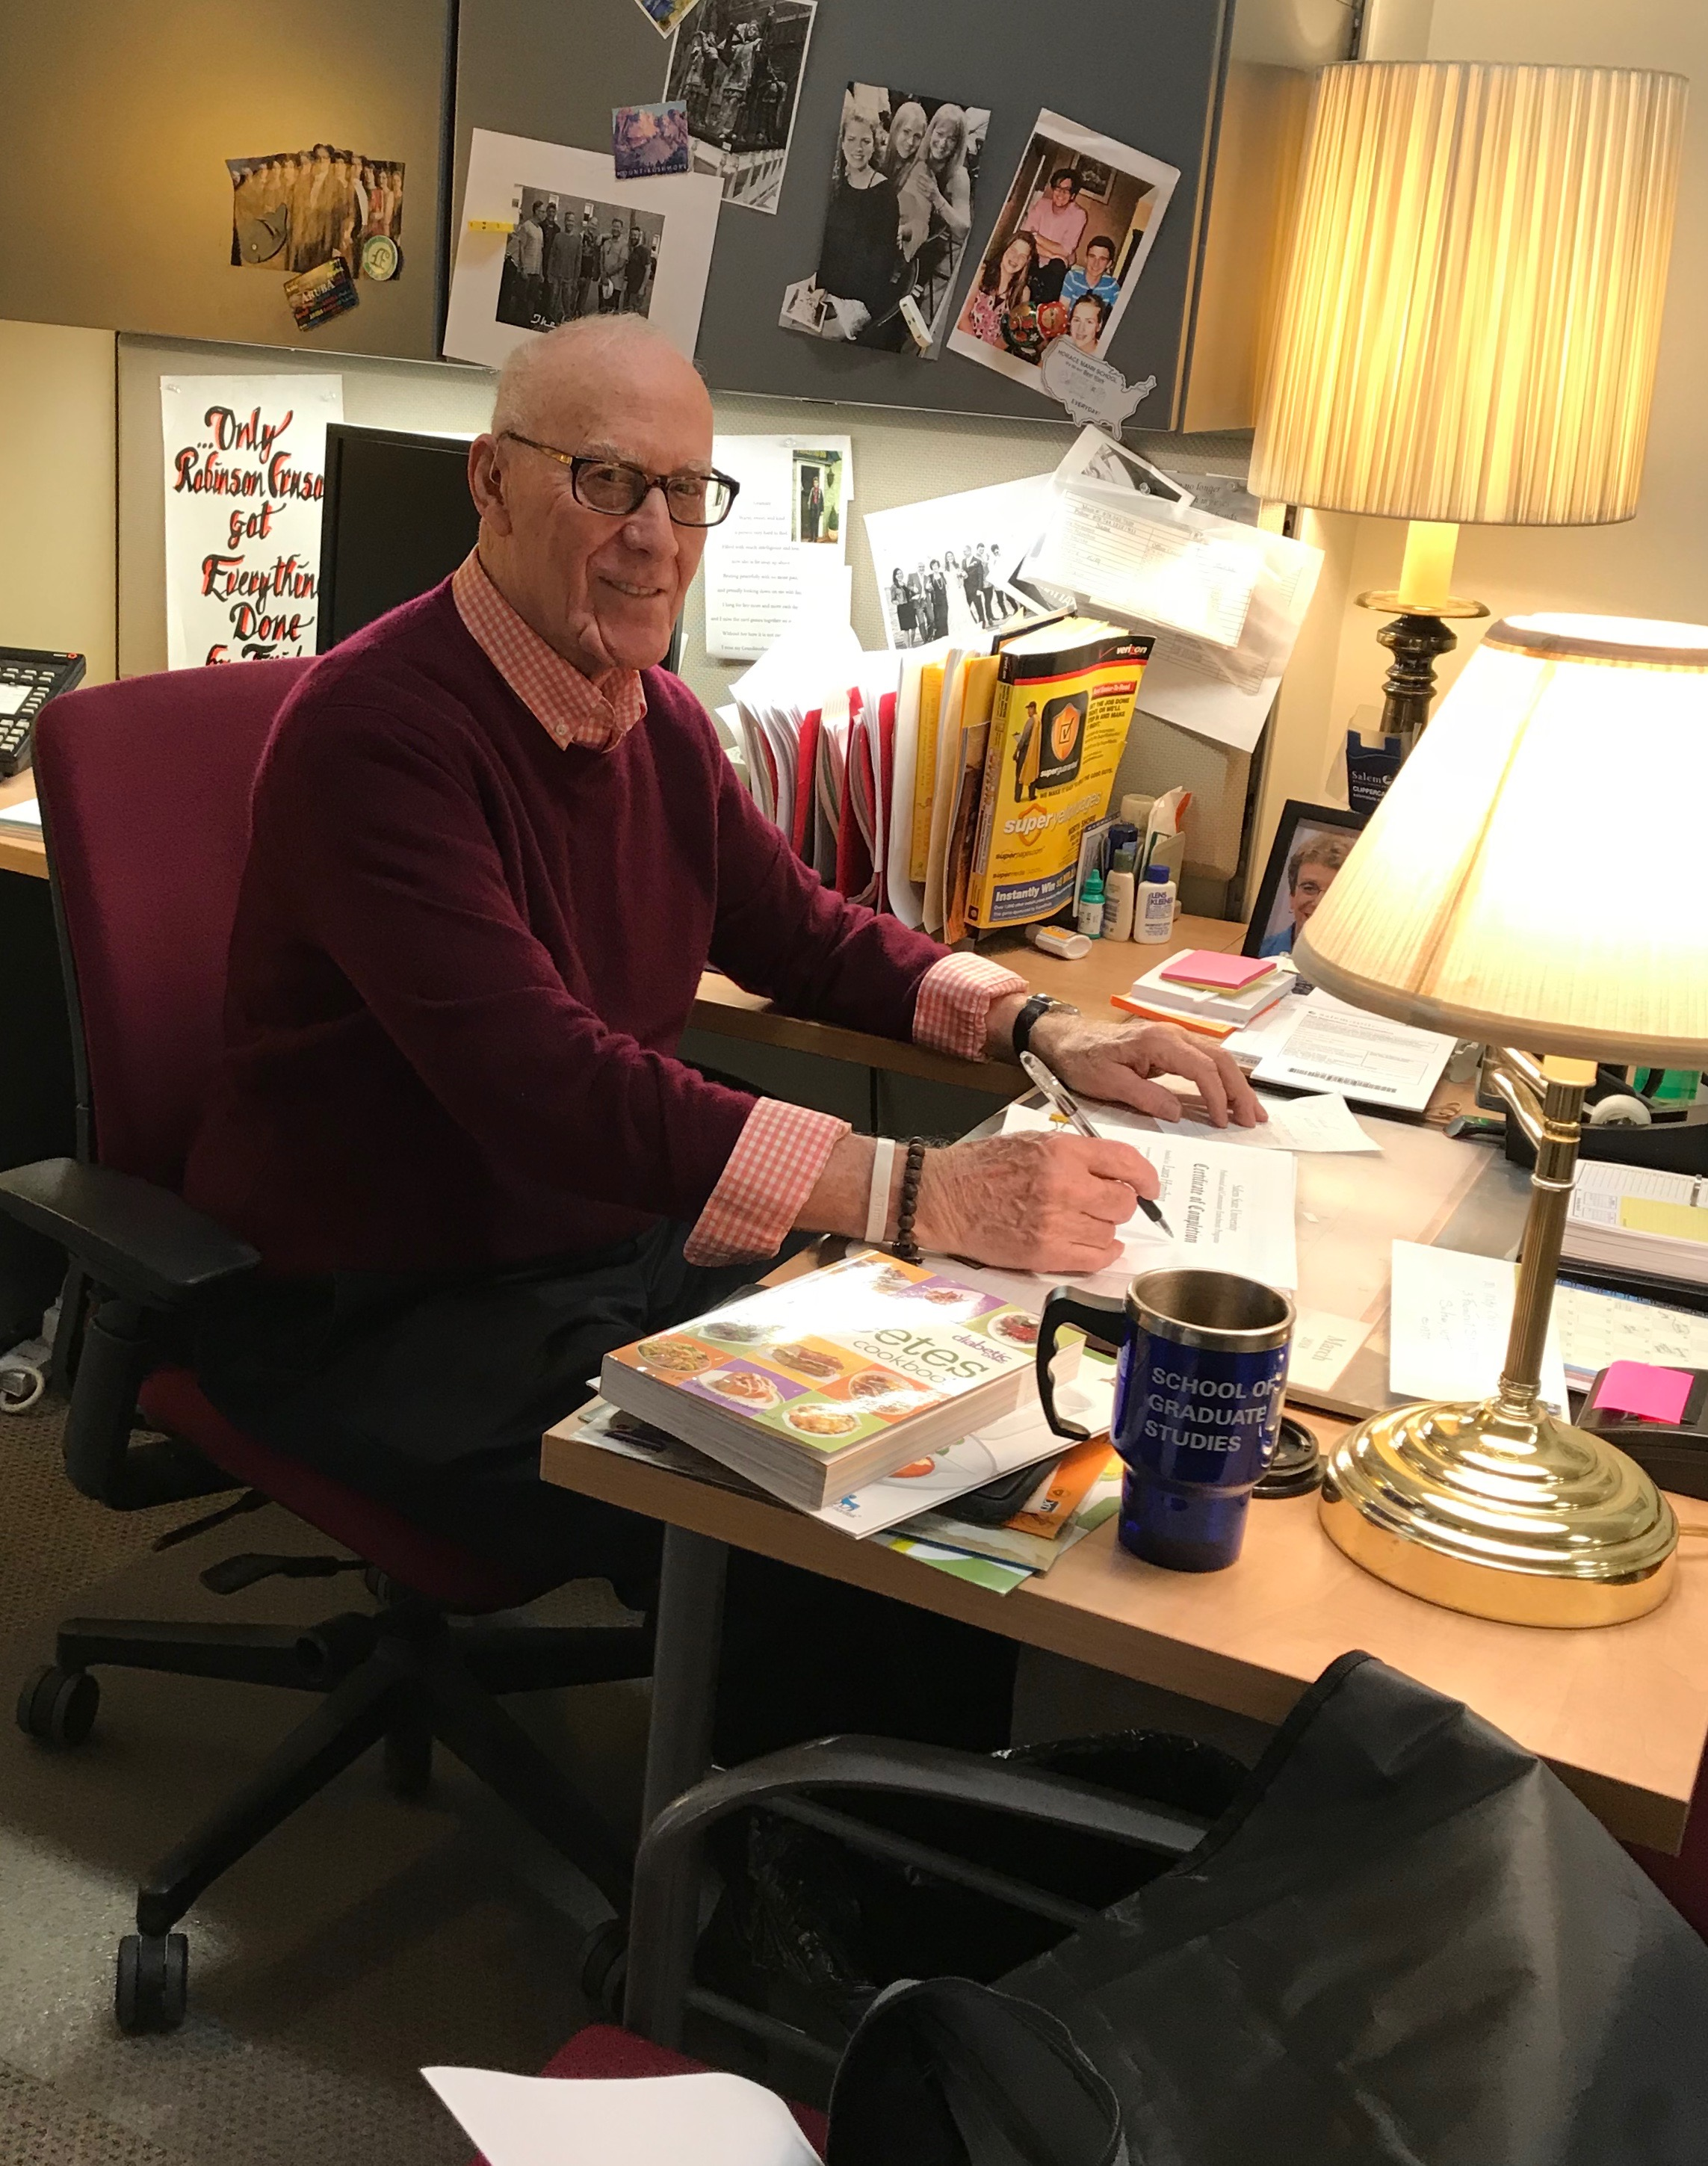 Brooksby Village resident Jerry Rosen works four days a week at Salem State University.